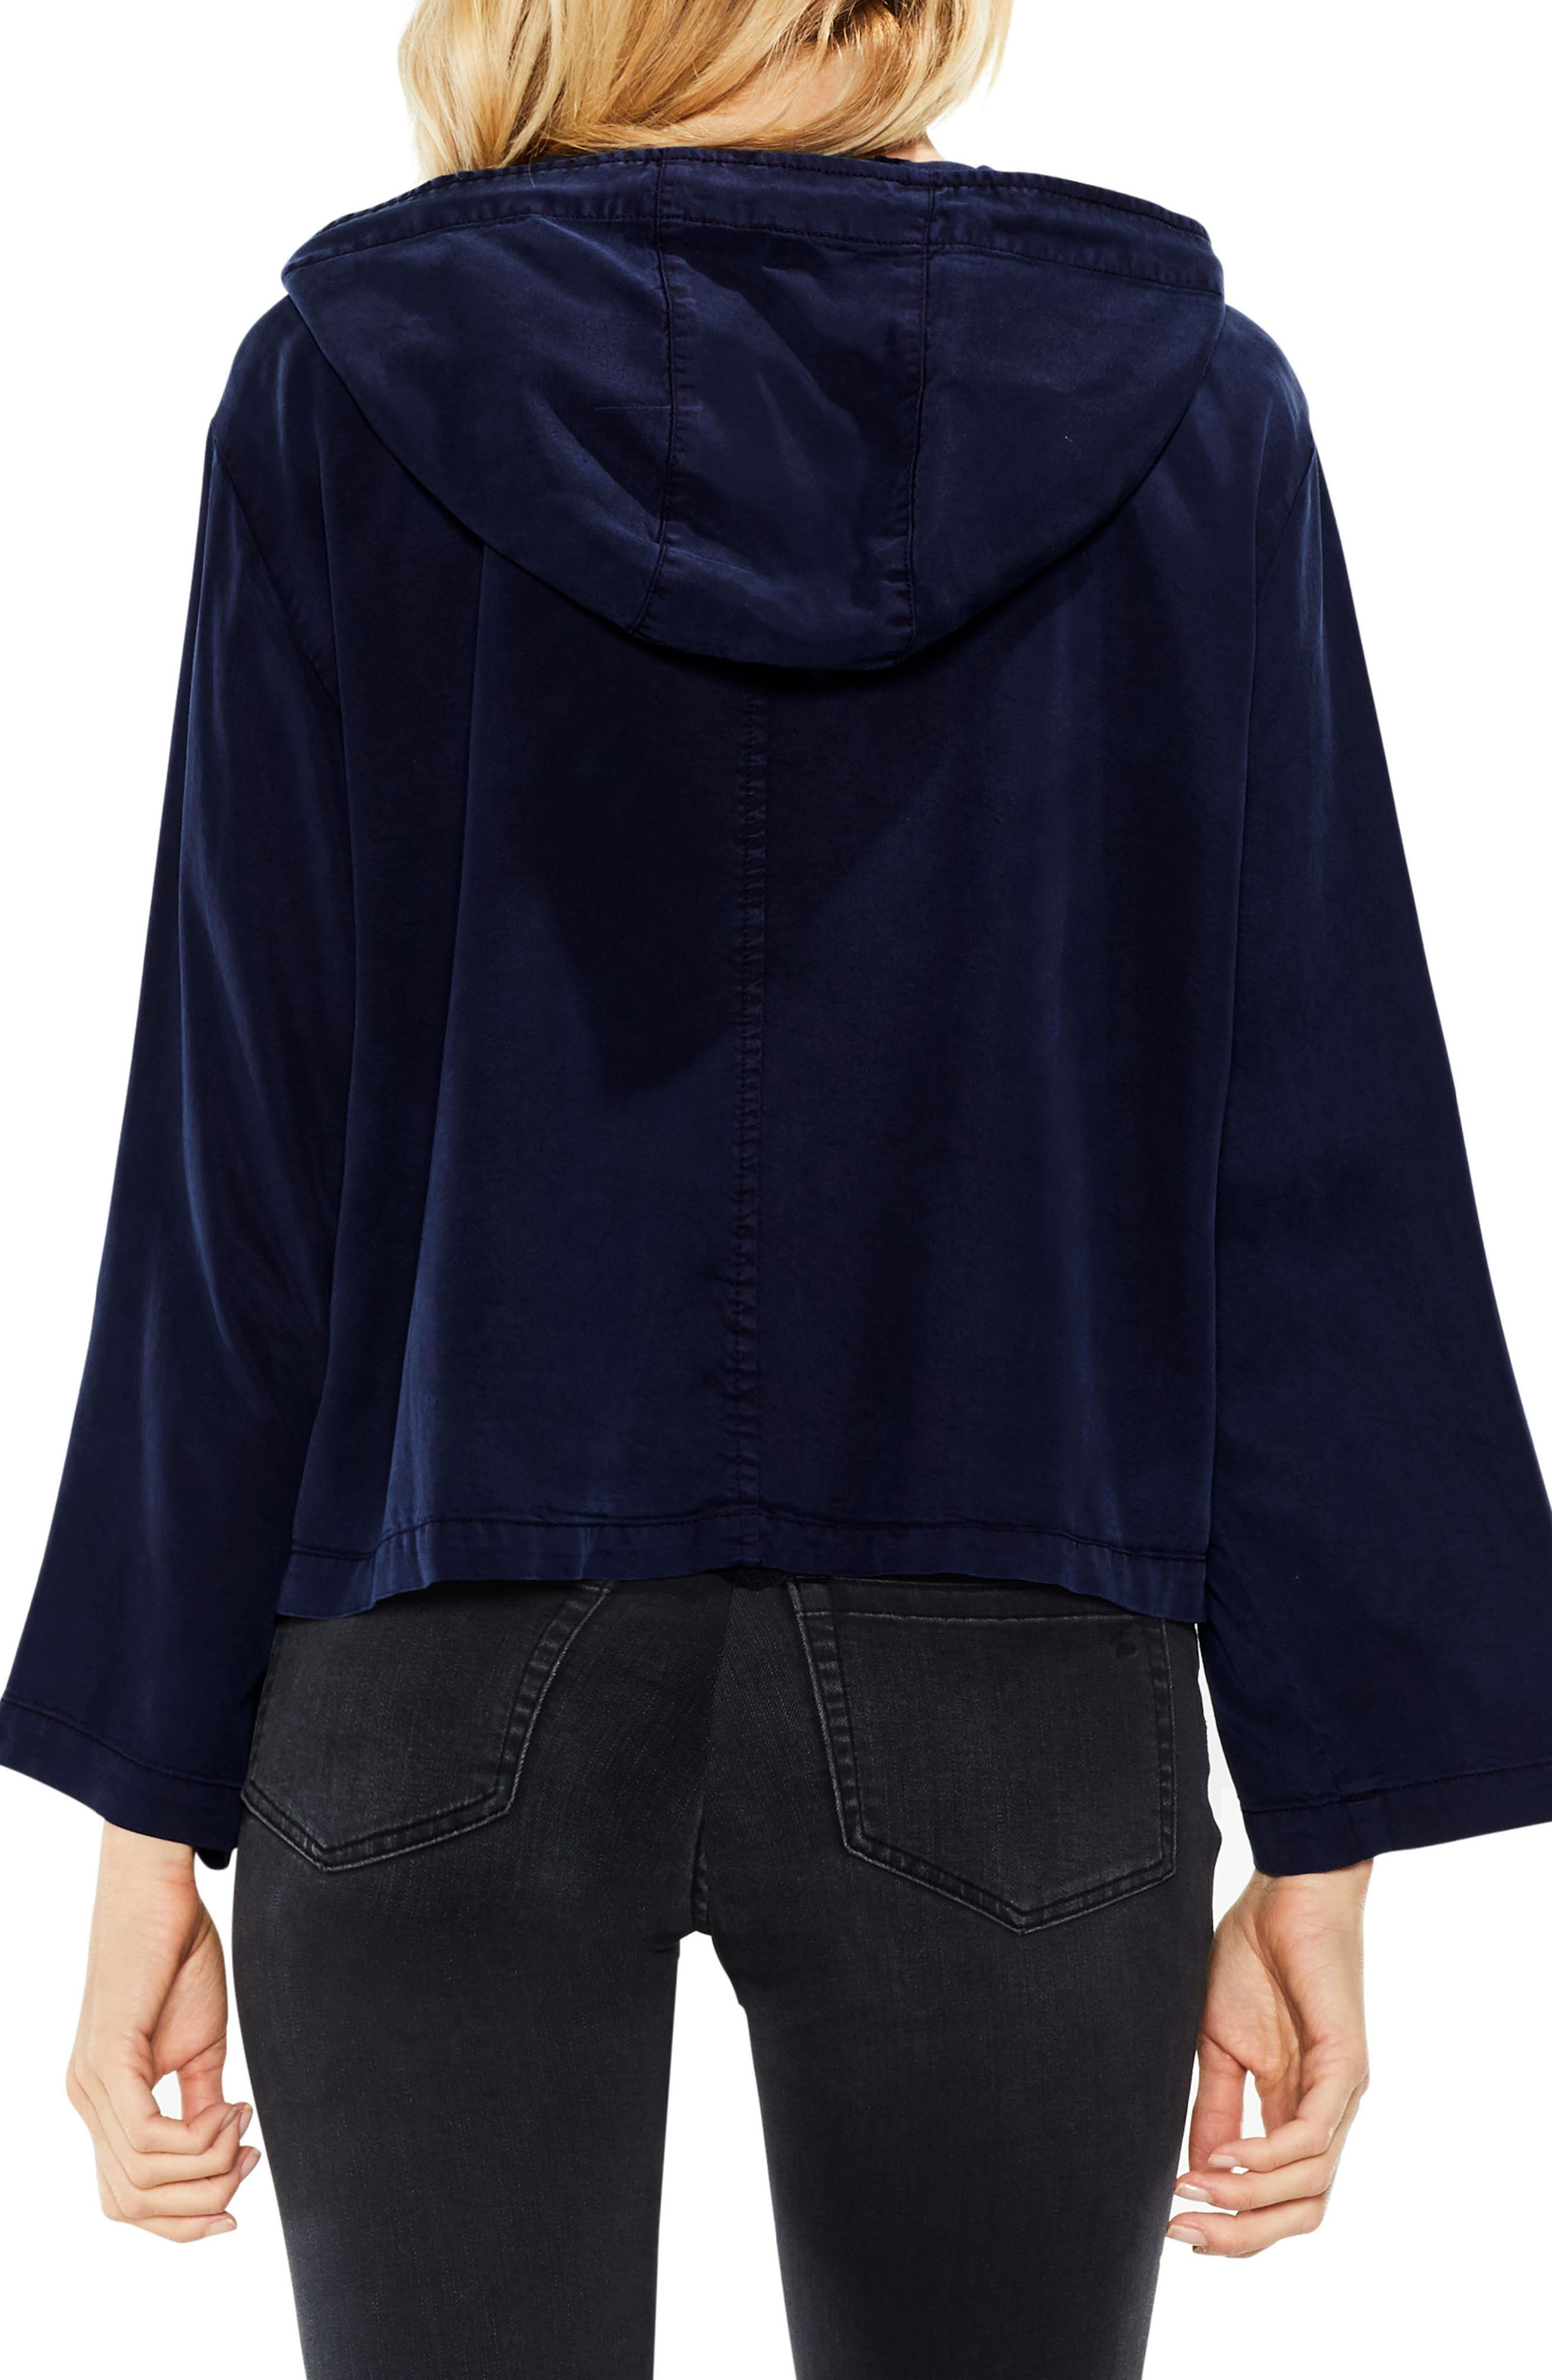 Bell Sleeve Hooded Jacket,                             Alternate thumbnail 3, color,